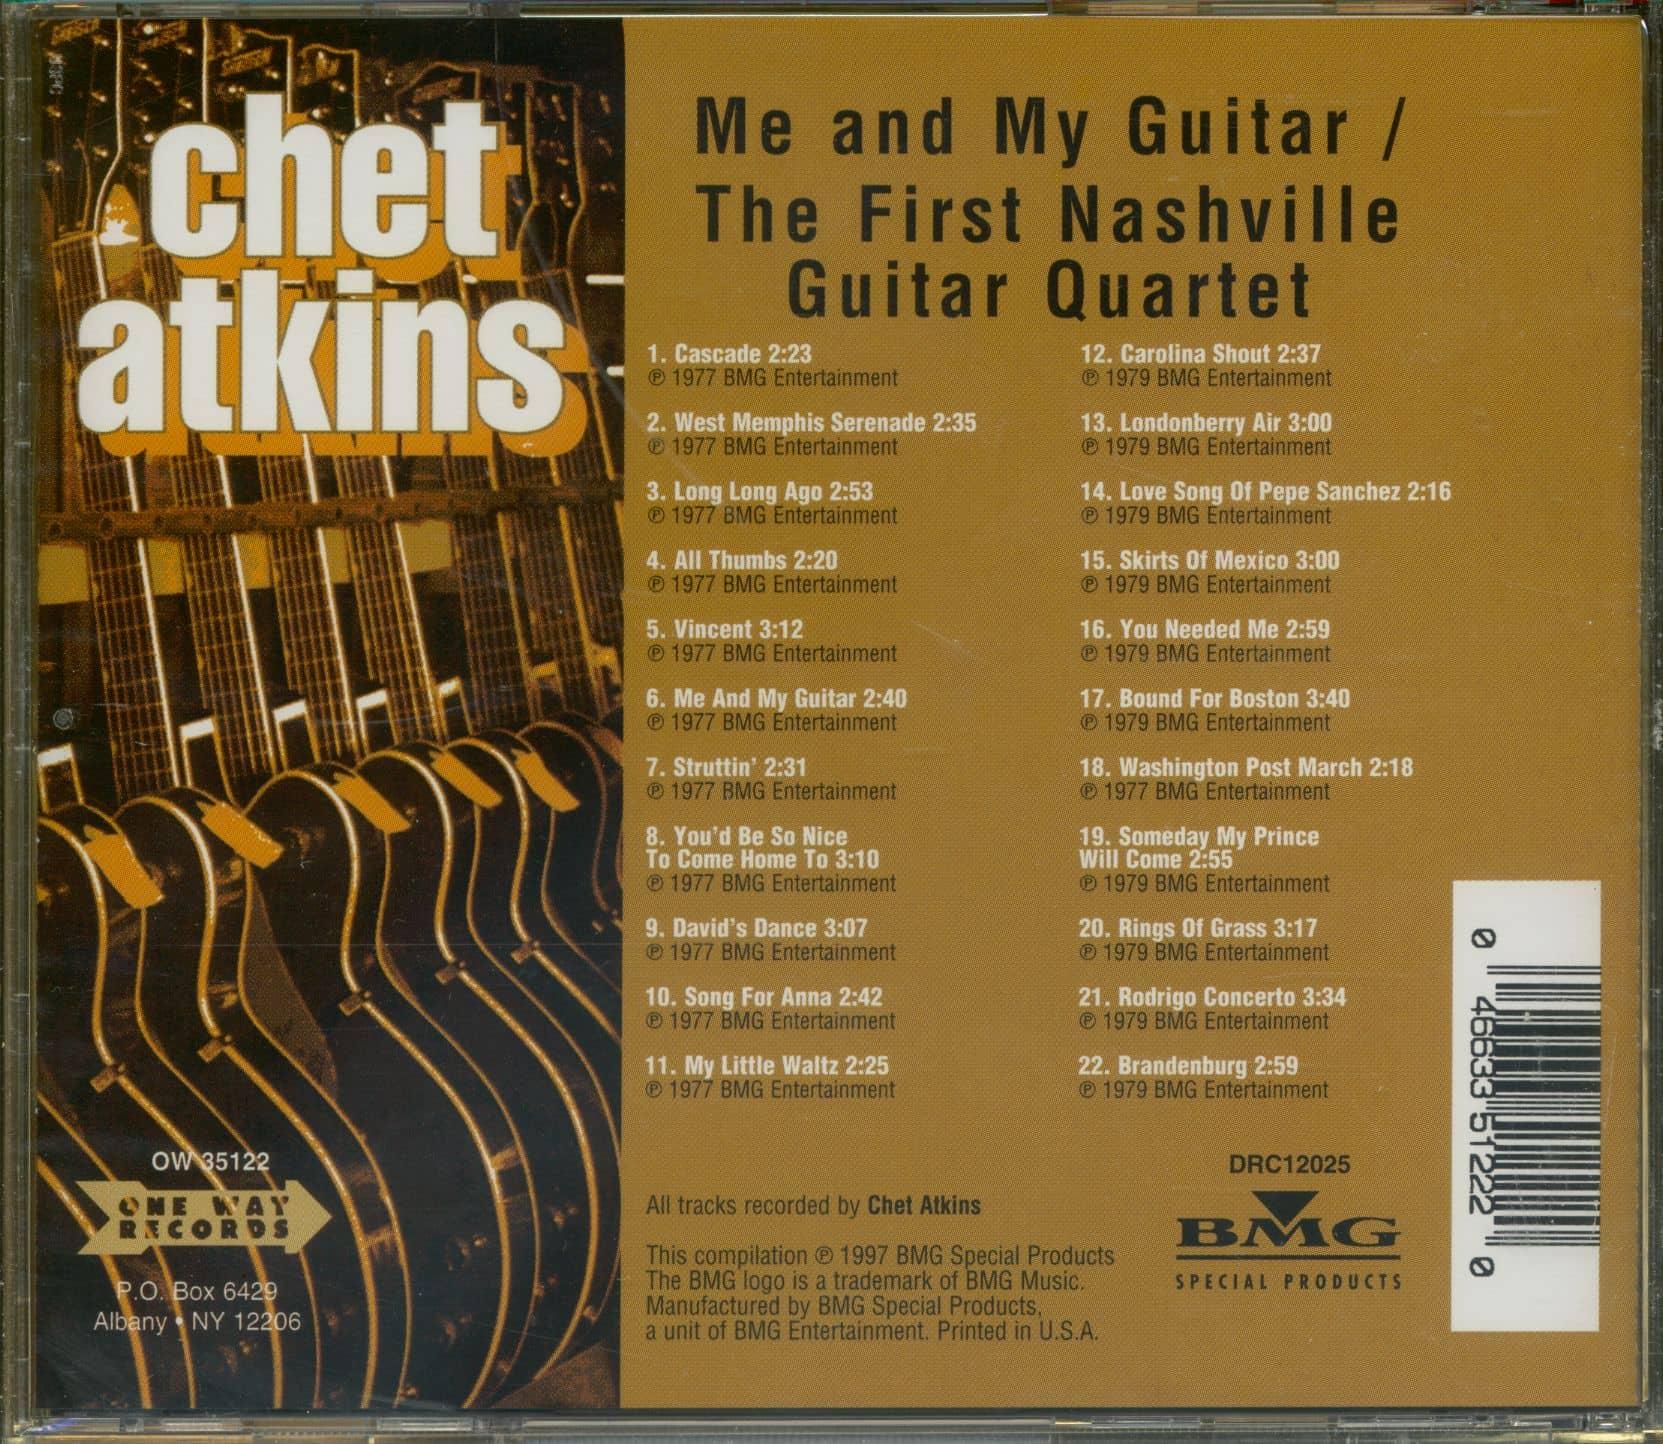 atkins chet cd me and my guitar the first nashville guitar quartet cd bear family records. Black Bedroom Furniture Sets. Home Design Ideas